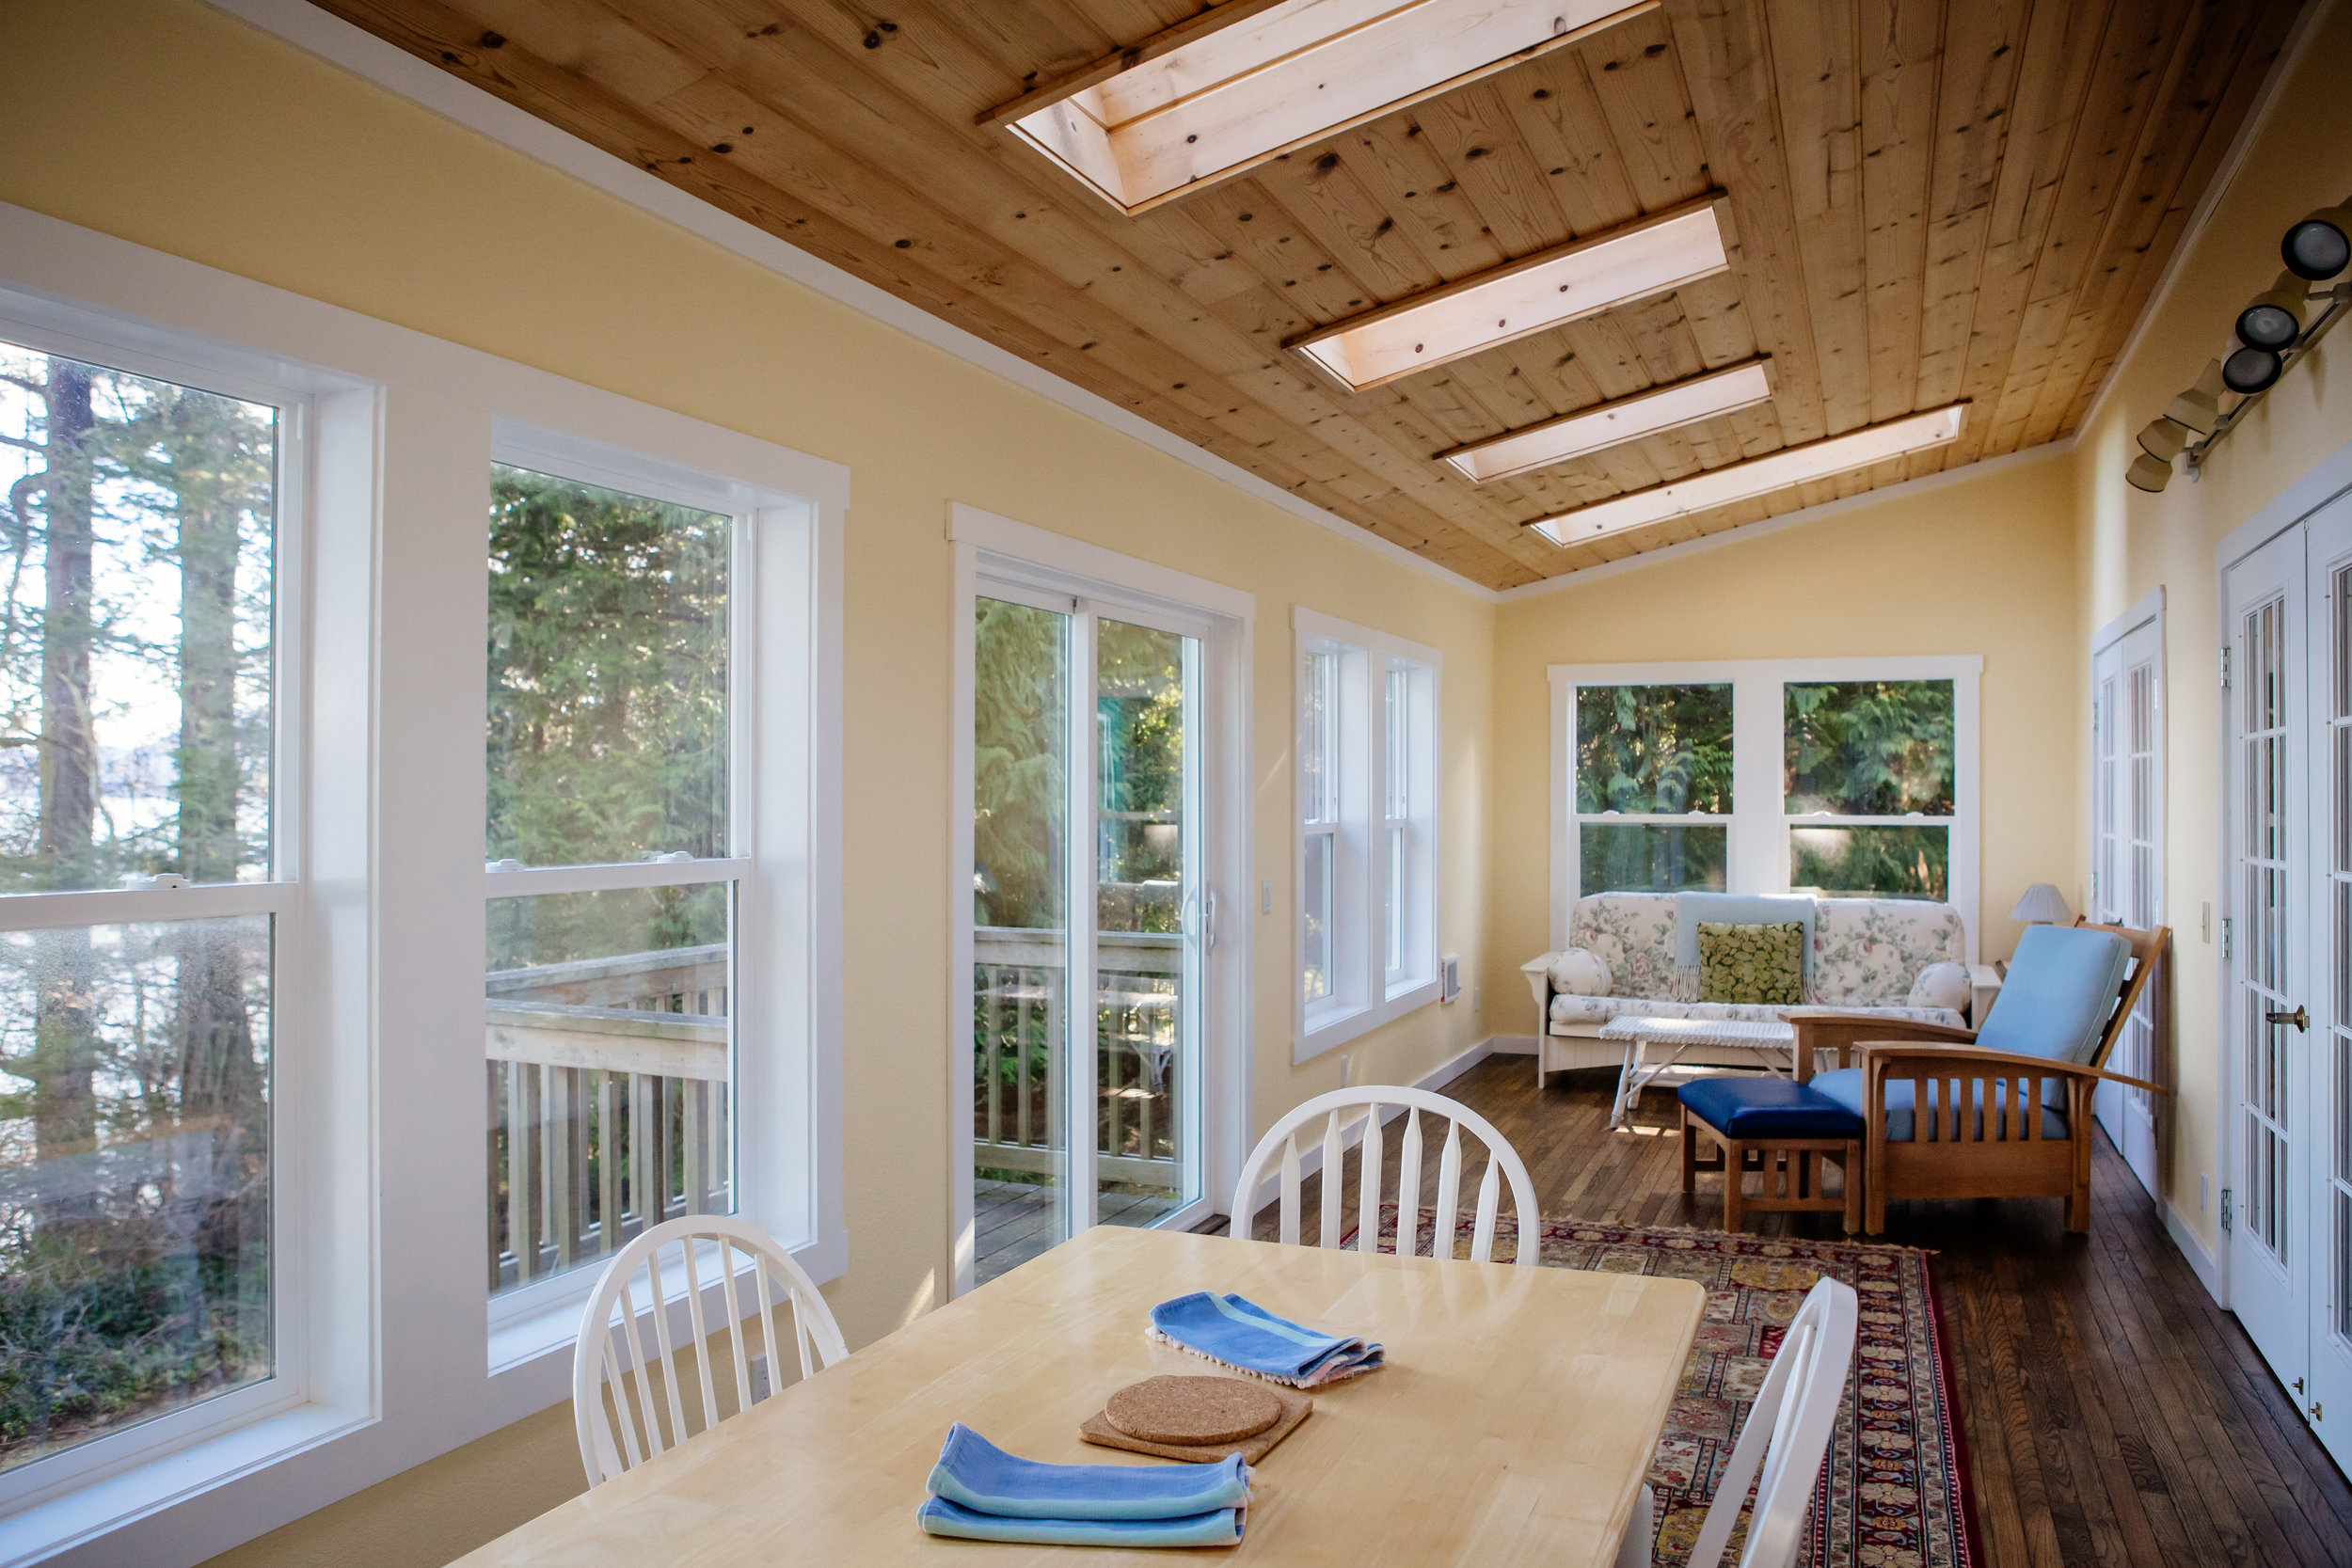 170217-Bayside Cottages Bayside Beach House-0008.jpg